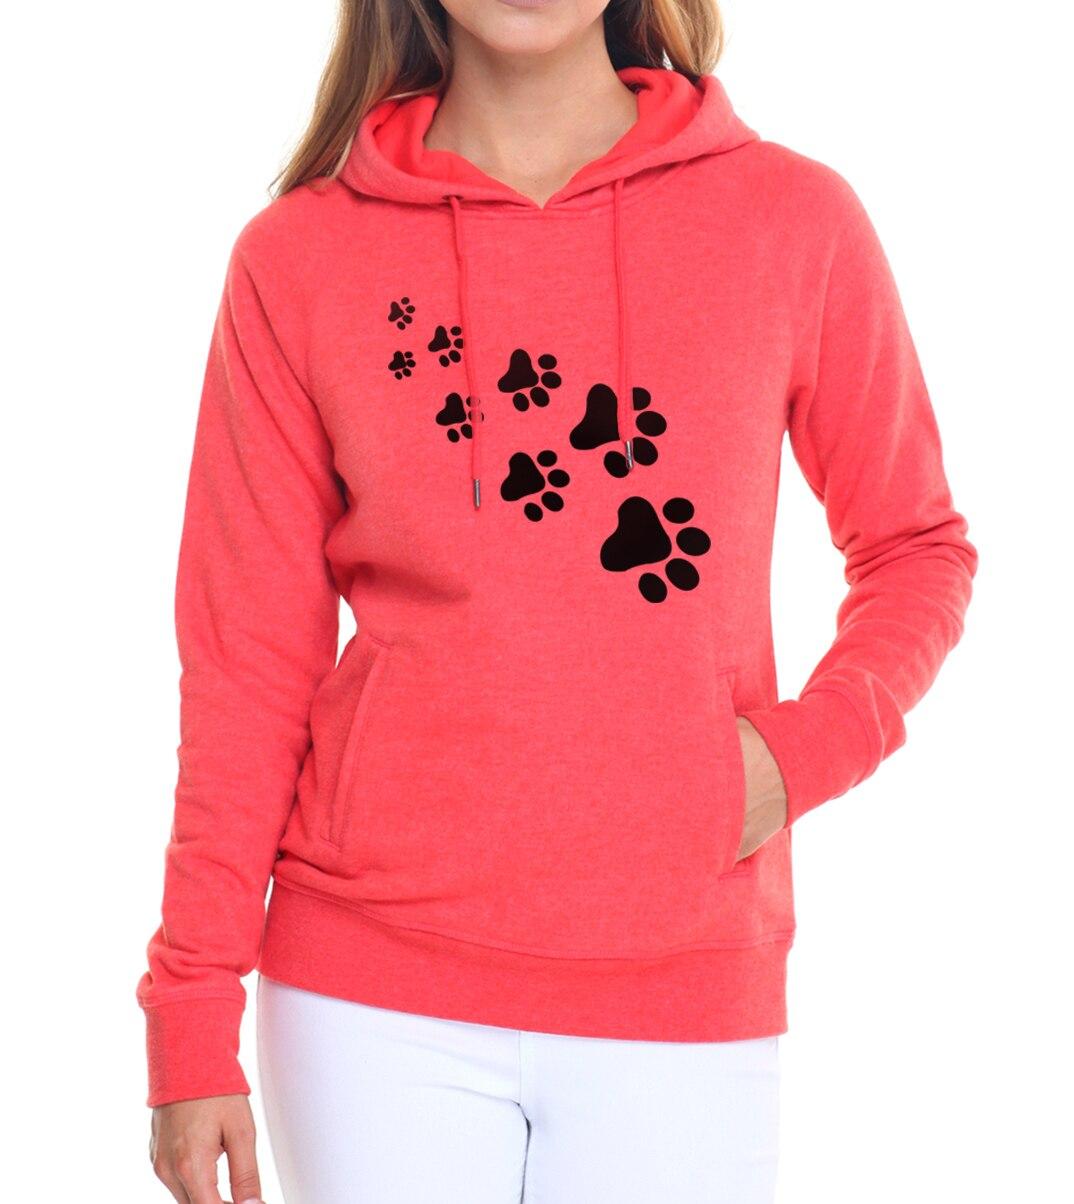 Casual fleece autumn winter sweatshirt pullovers 17 kawaii cat paws print hoodies for Women black pink brand tracksuits femme 9